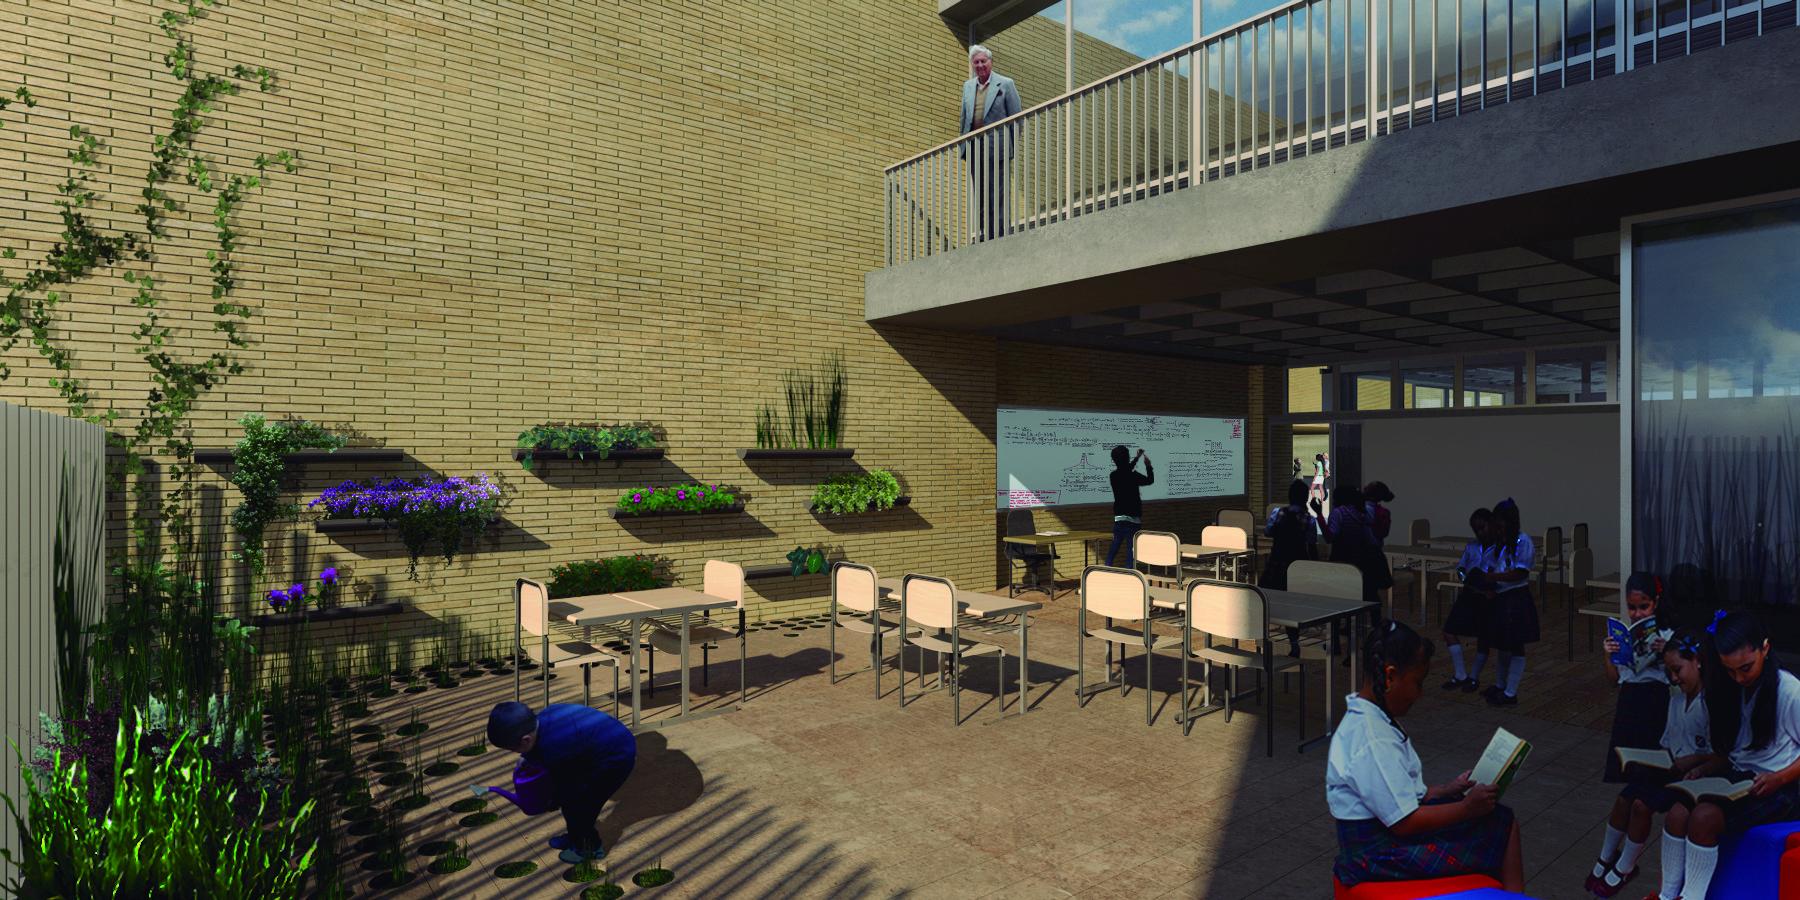 Vista aula de primaria . Image Courtesy of FP – oficina de arquitectura + Arq. Camilo Foronda